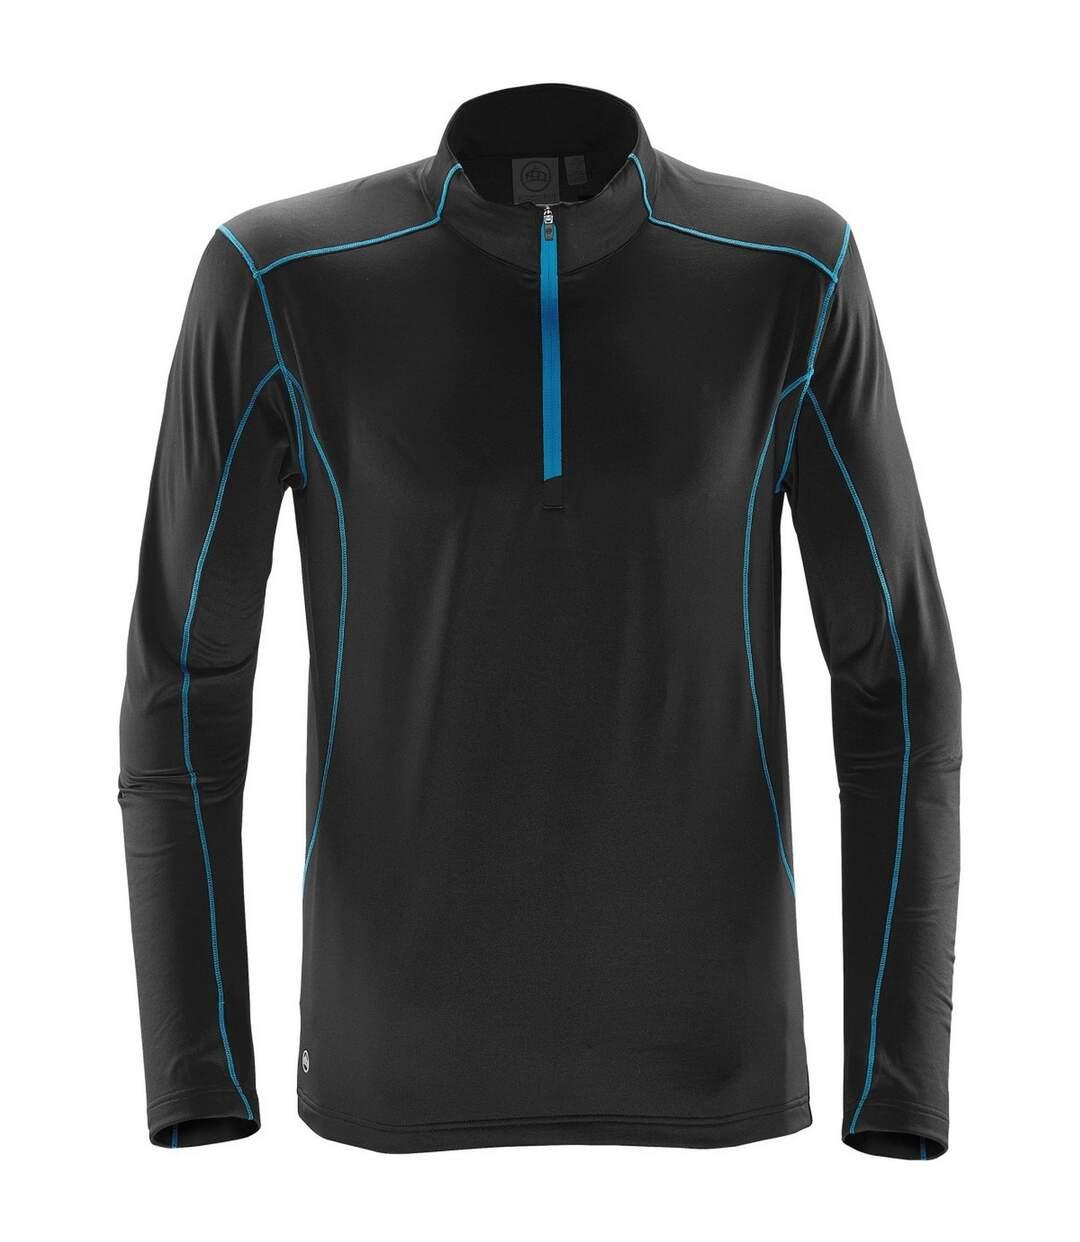 Stormtech Mens Pulse Fleece Pullover (Black/Electric Blue) - UTBC4121